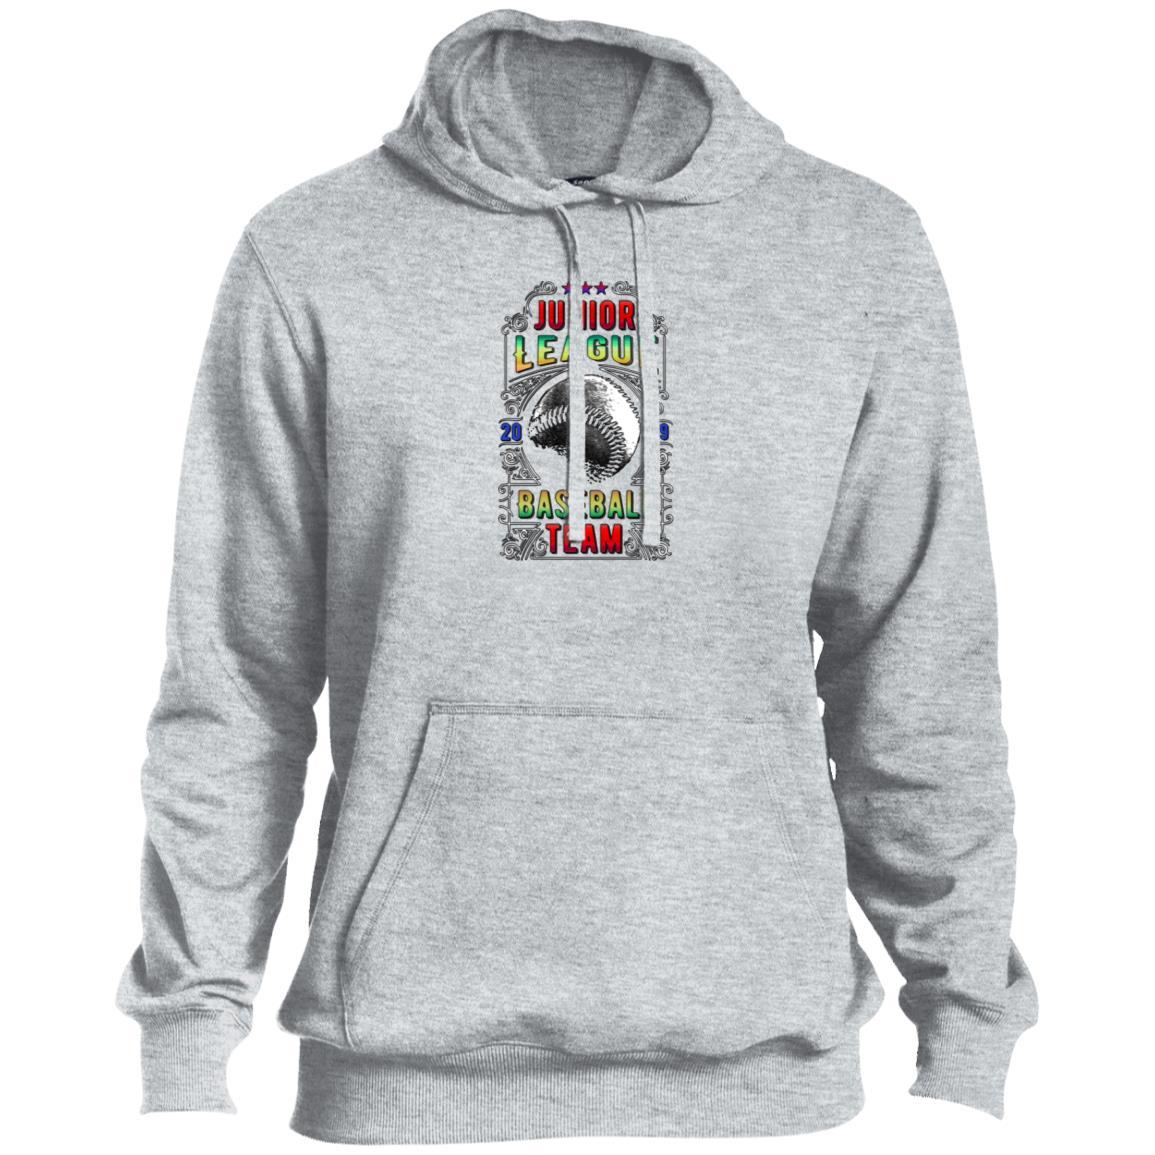 Junior League Sport-Tek Tall Pullover Hoodie